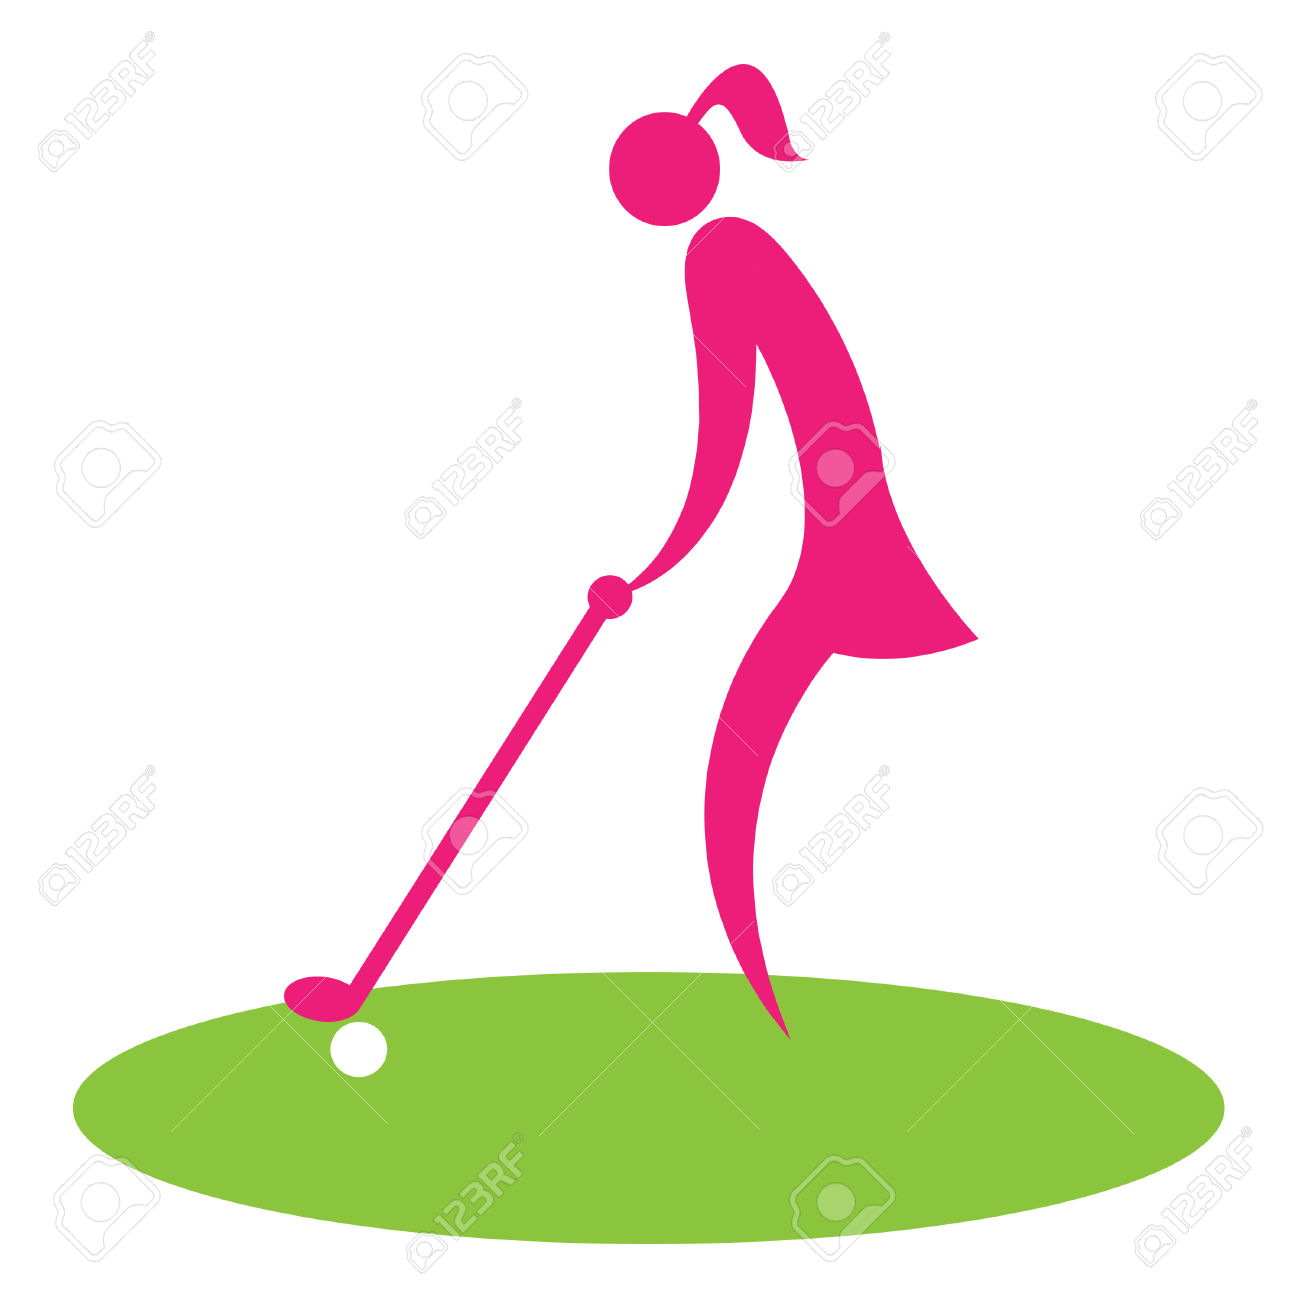 1300x1300 Golf Course Clipart Woman Golfer